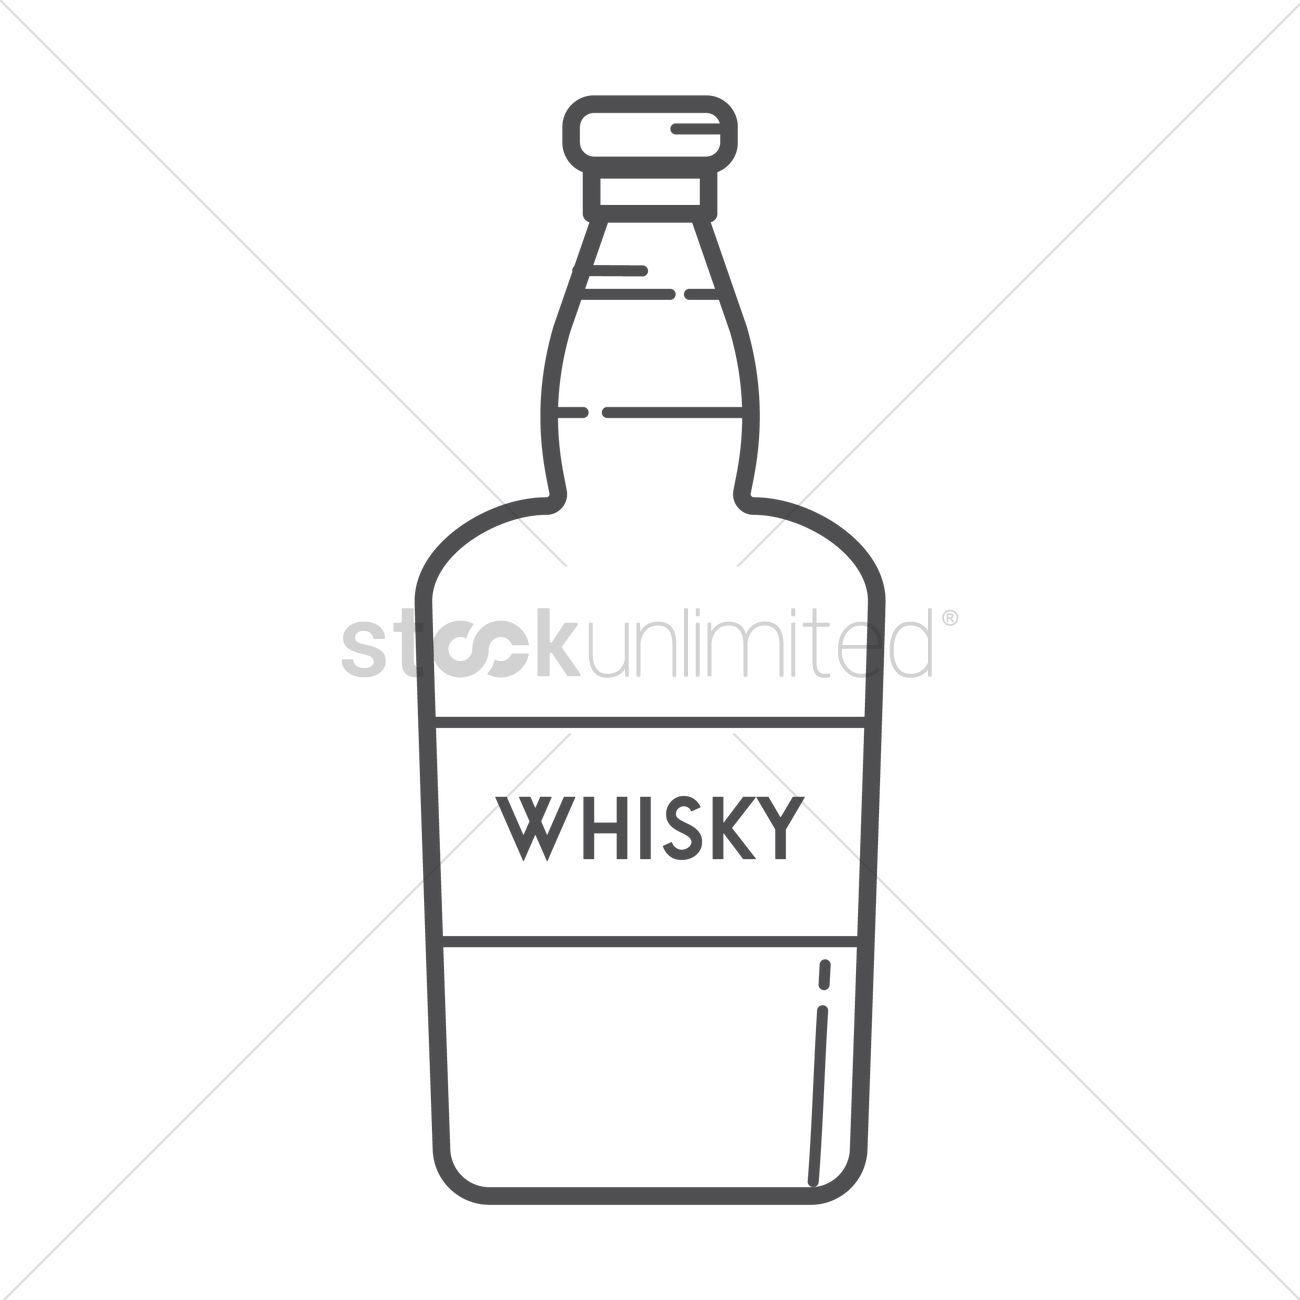 Whisky Bottle Vector Image - 1574802